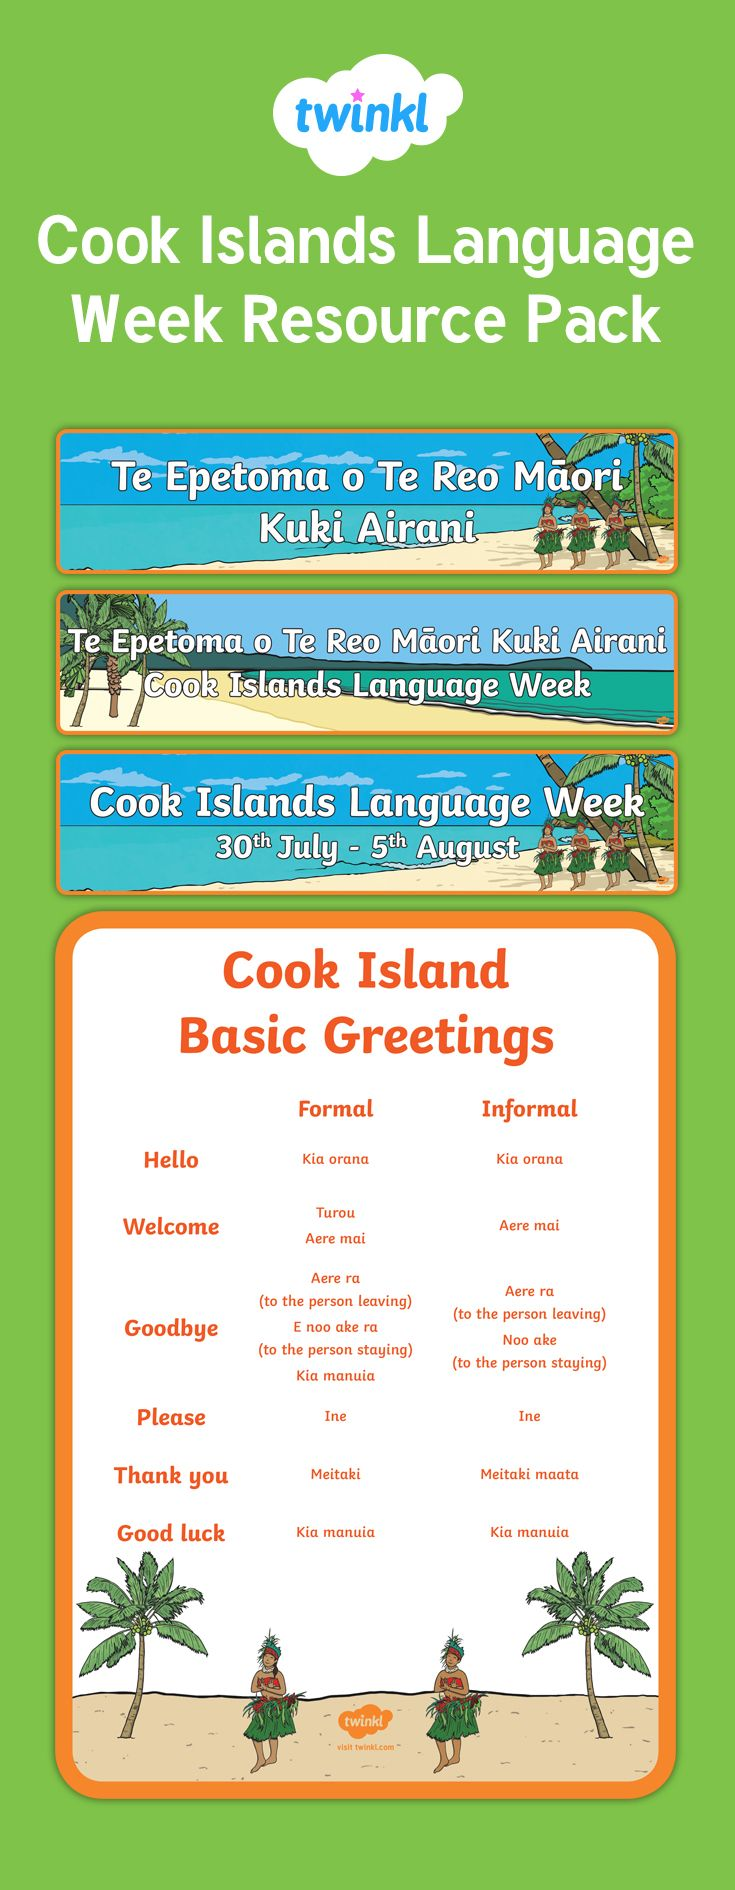 8 best cook island language week images on pinterest cook islands cook island language week m4hsunfo